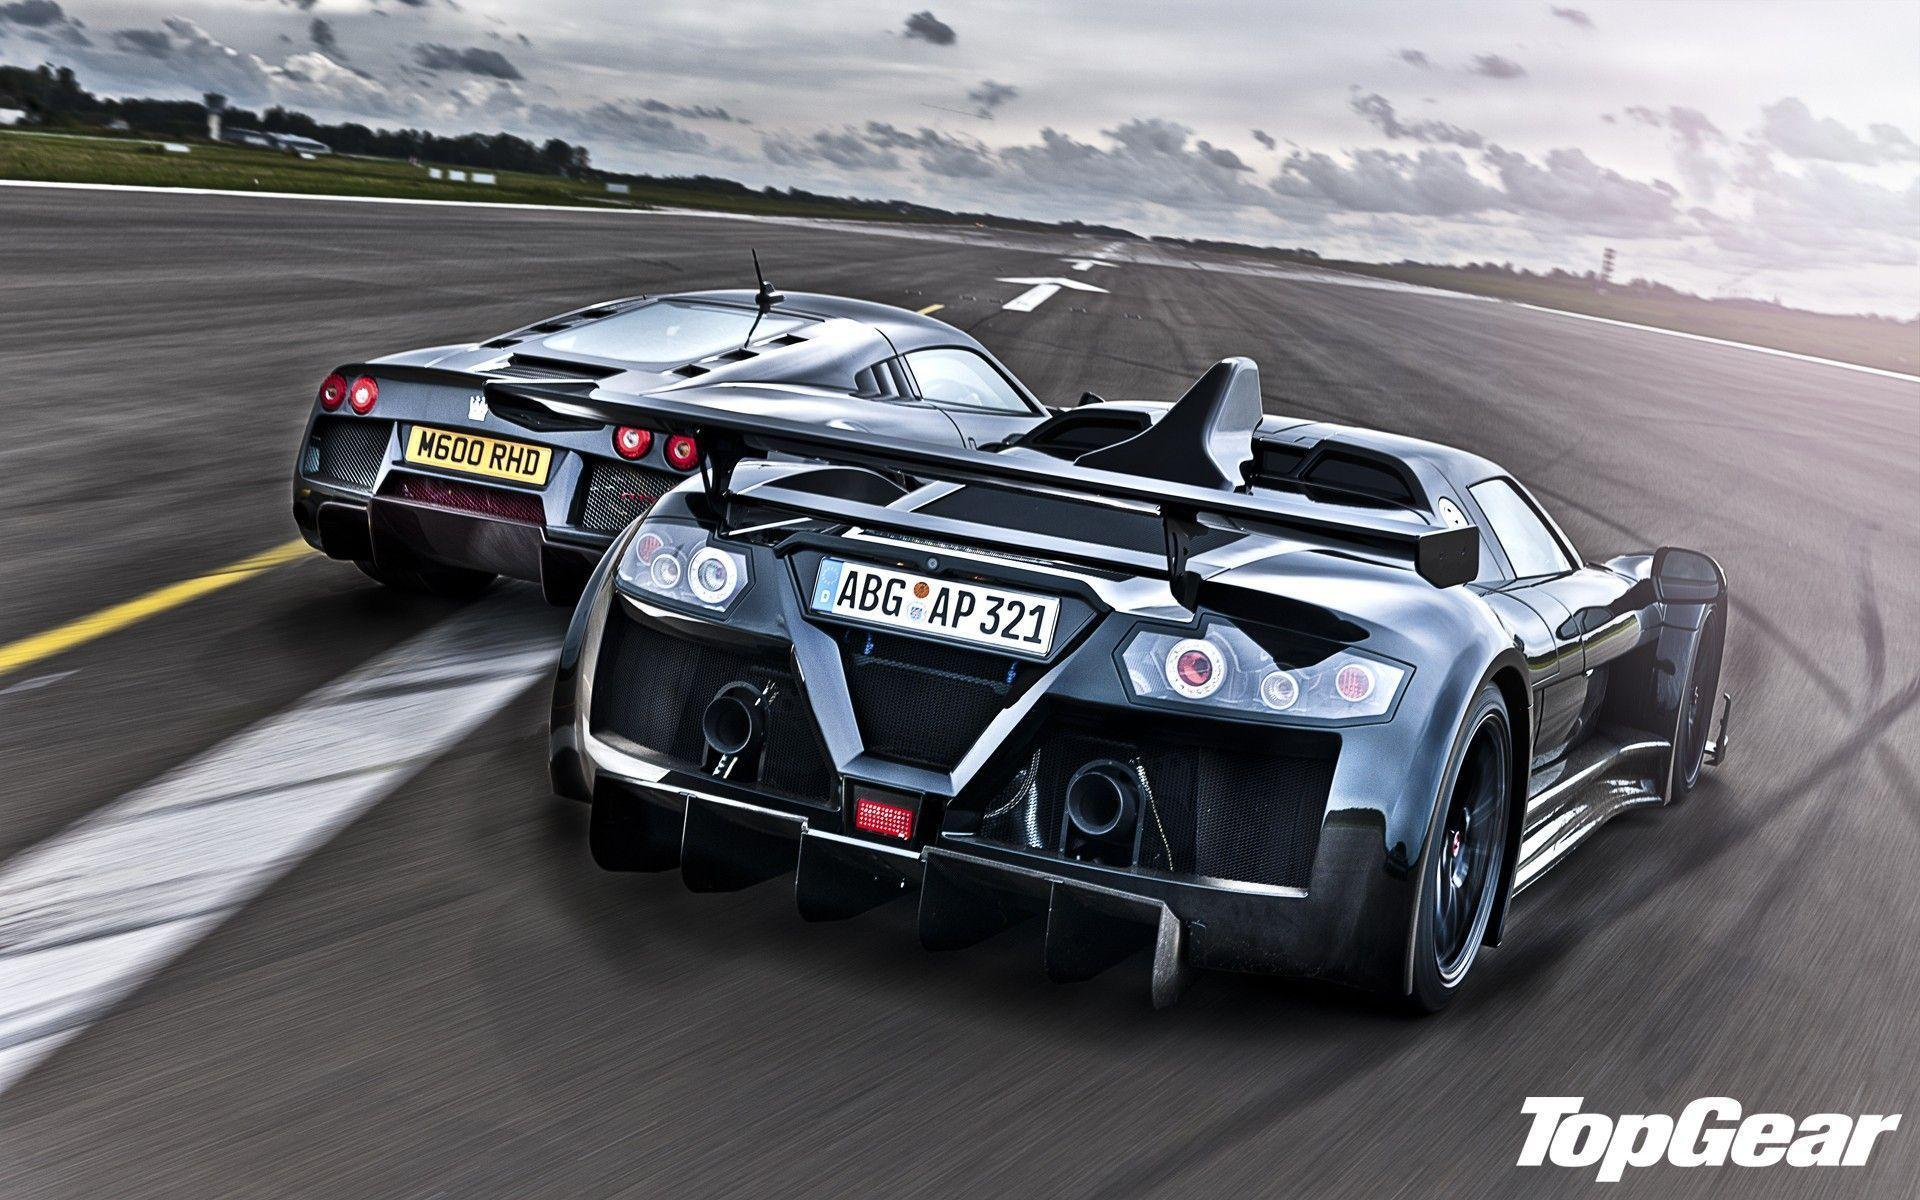 109 top gear wallpapers top gear backgrounds page 2 - Bugatti Veyron Super Sport Top Gear Wallpaper